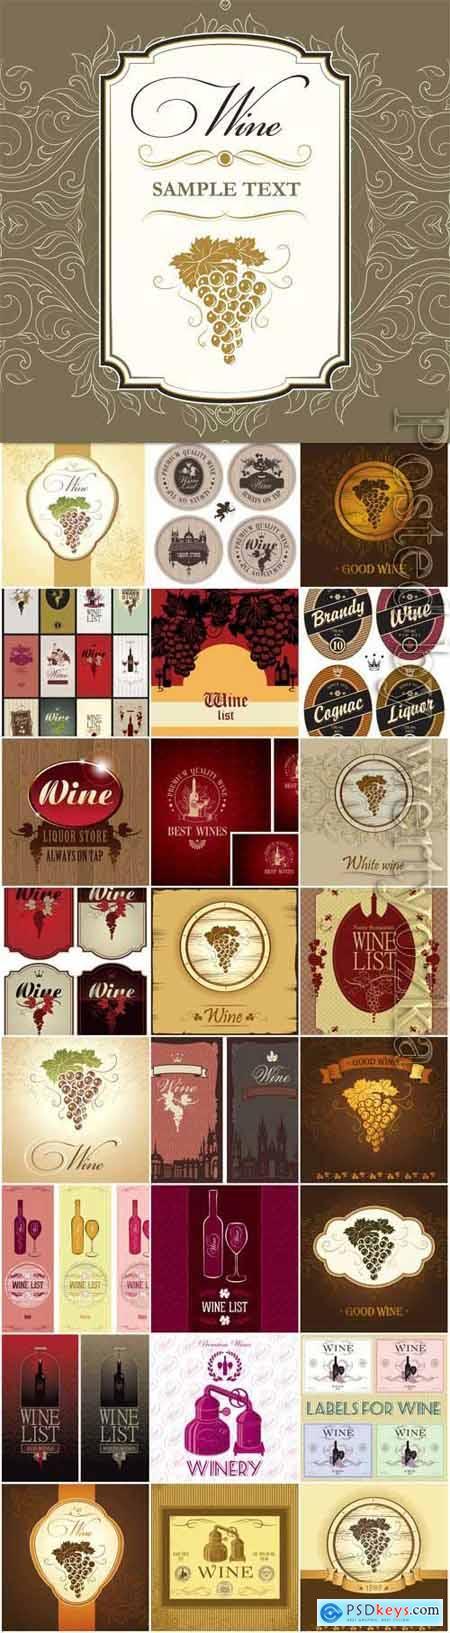 Retro wine labels for design in vector